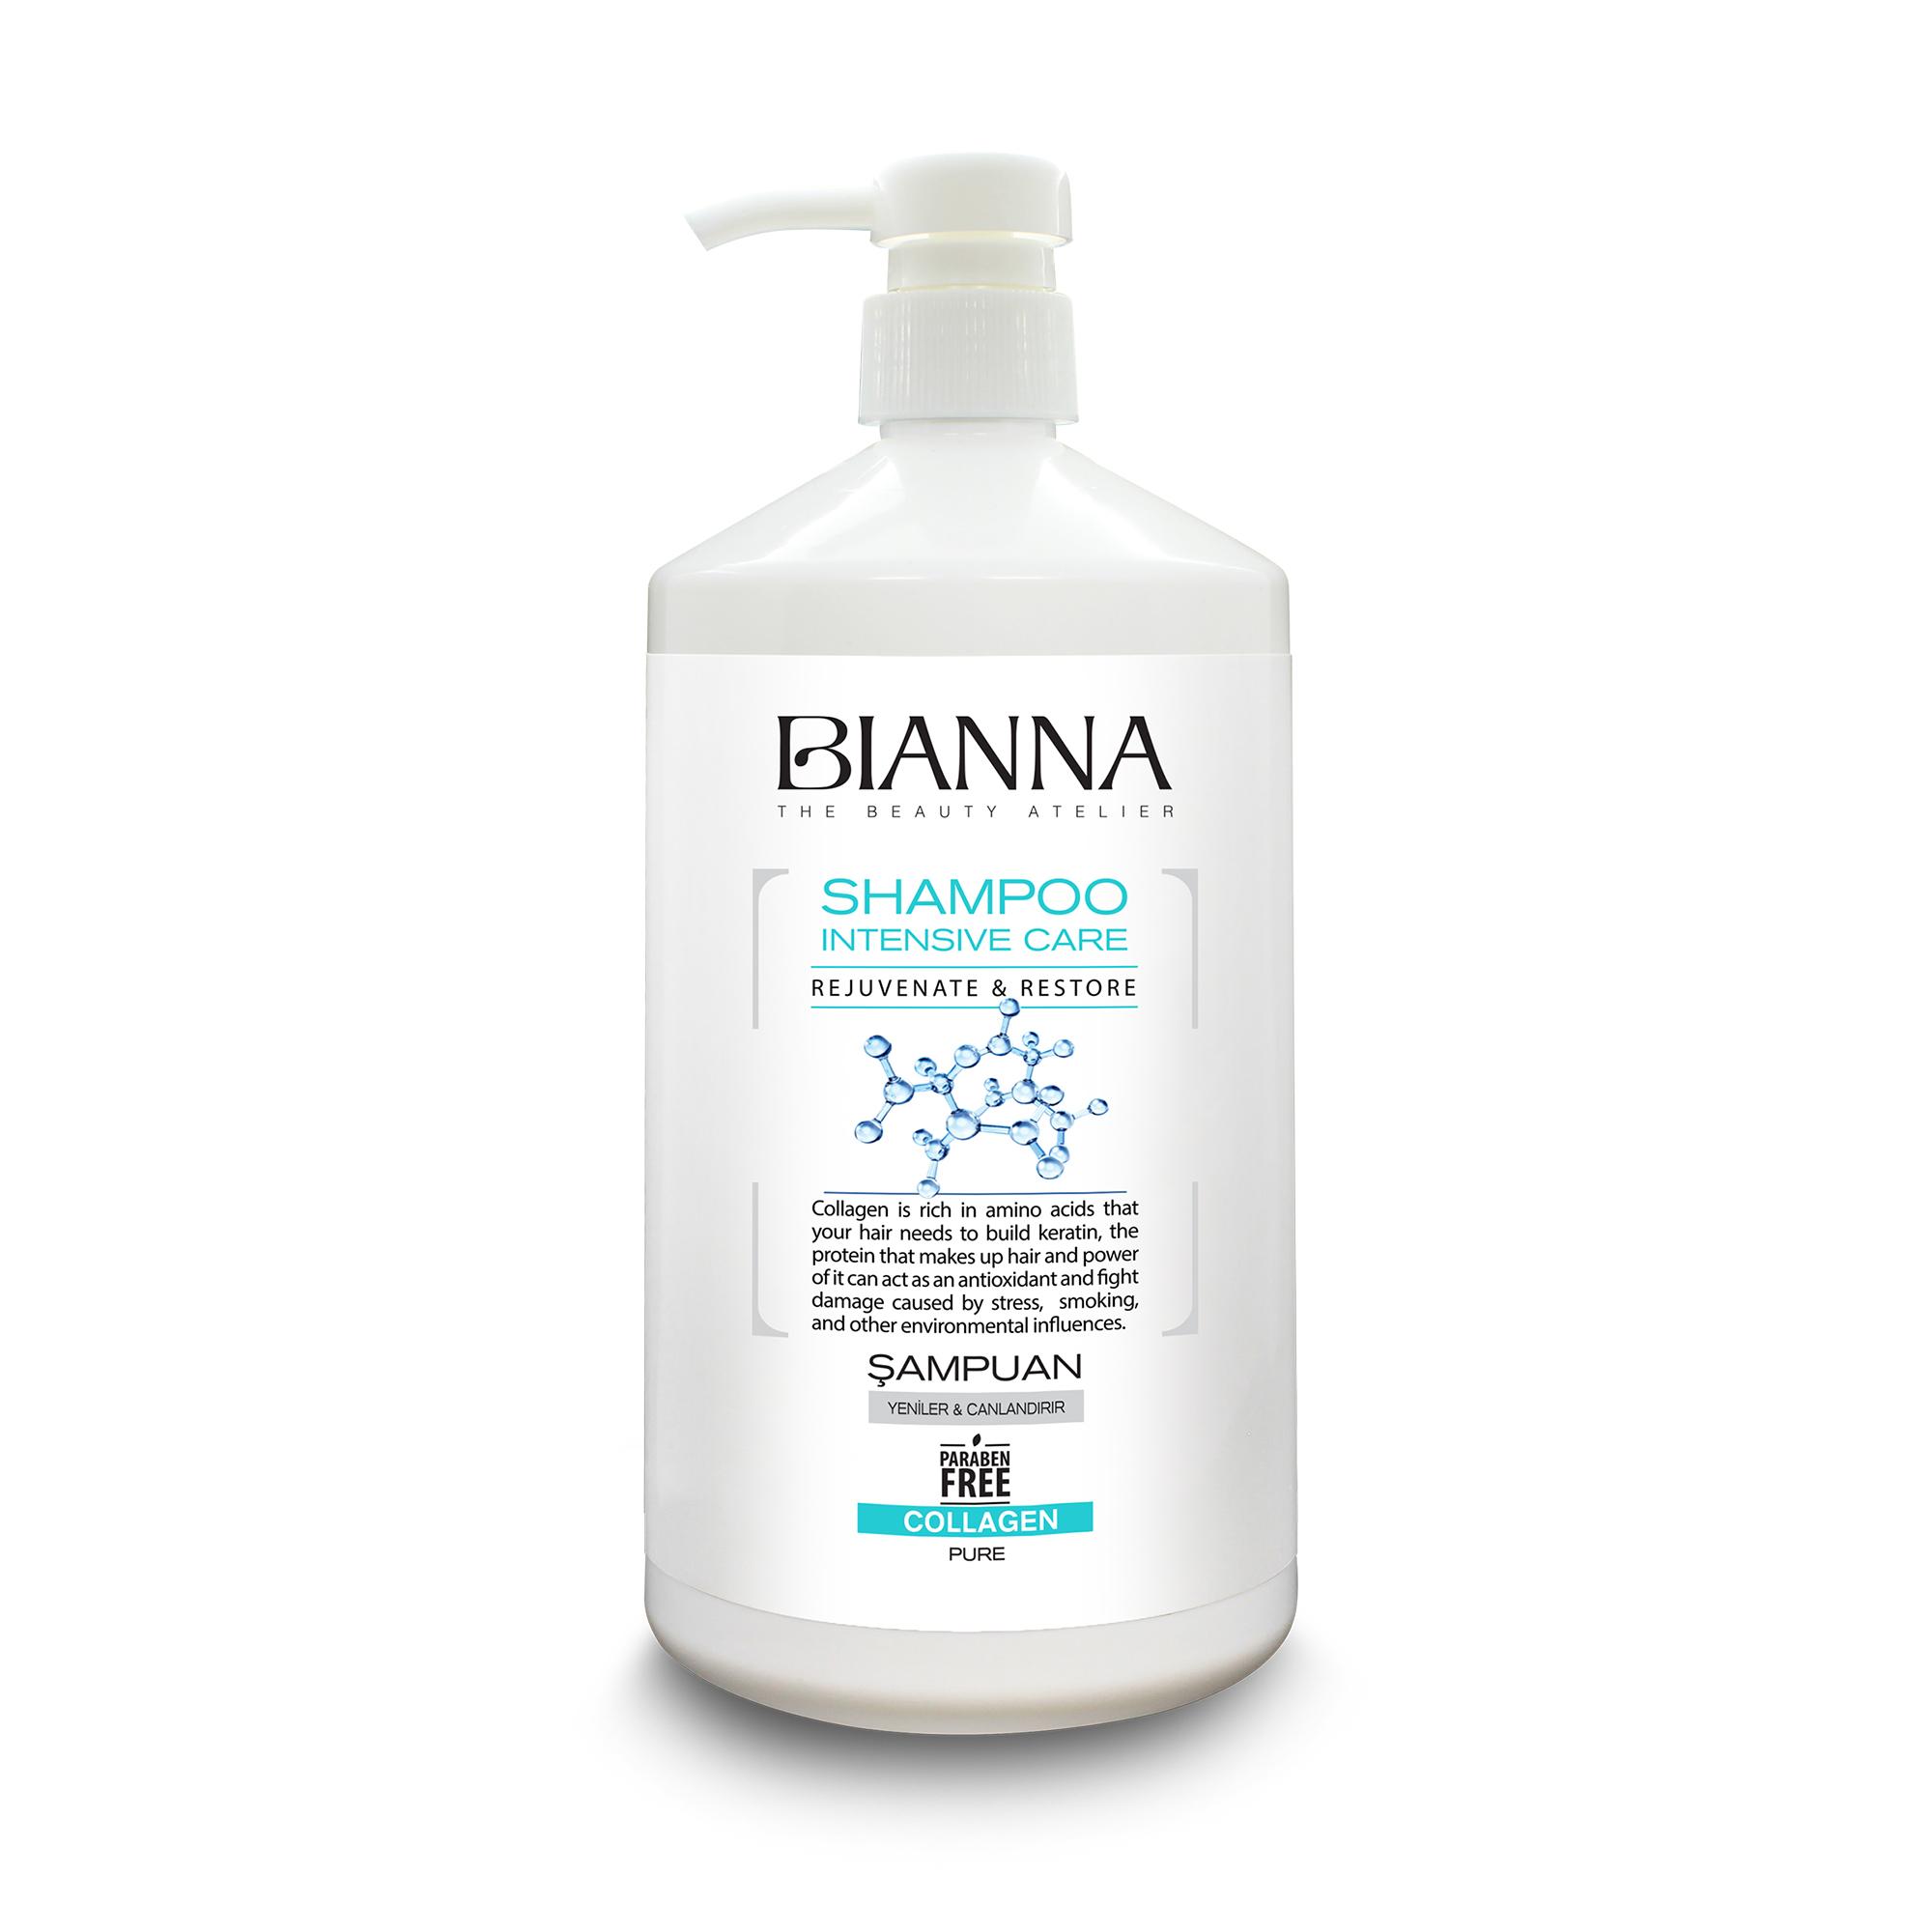 BIANNA HAIR SHAMPOO - COLLAGEN / 2225-04